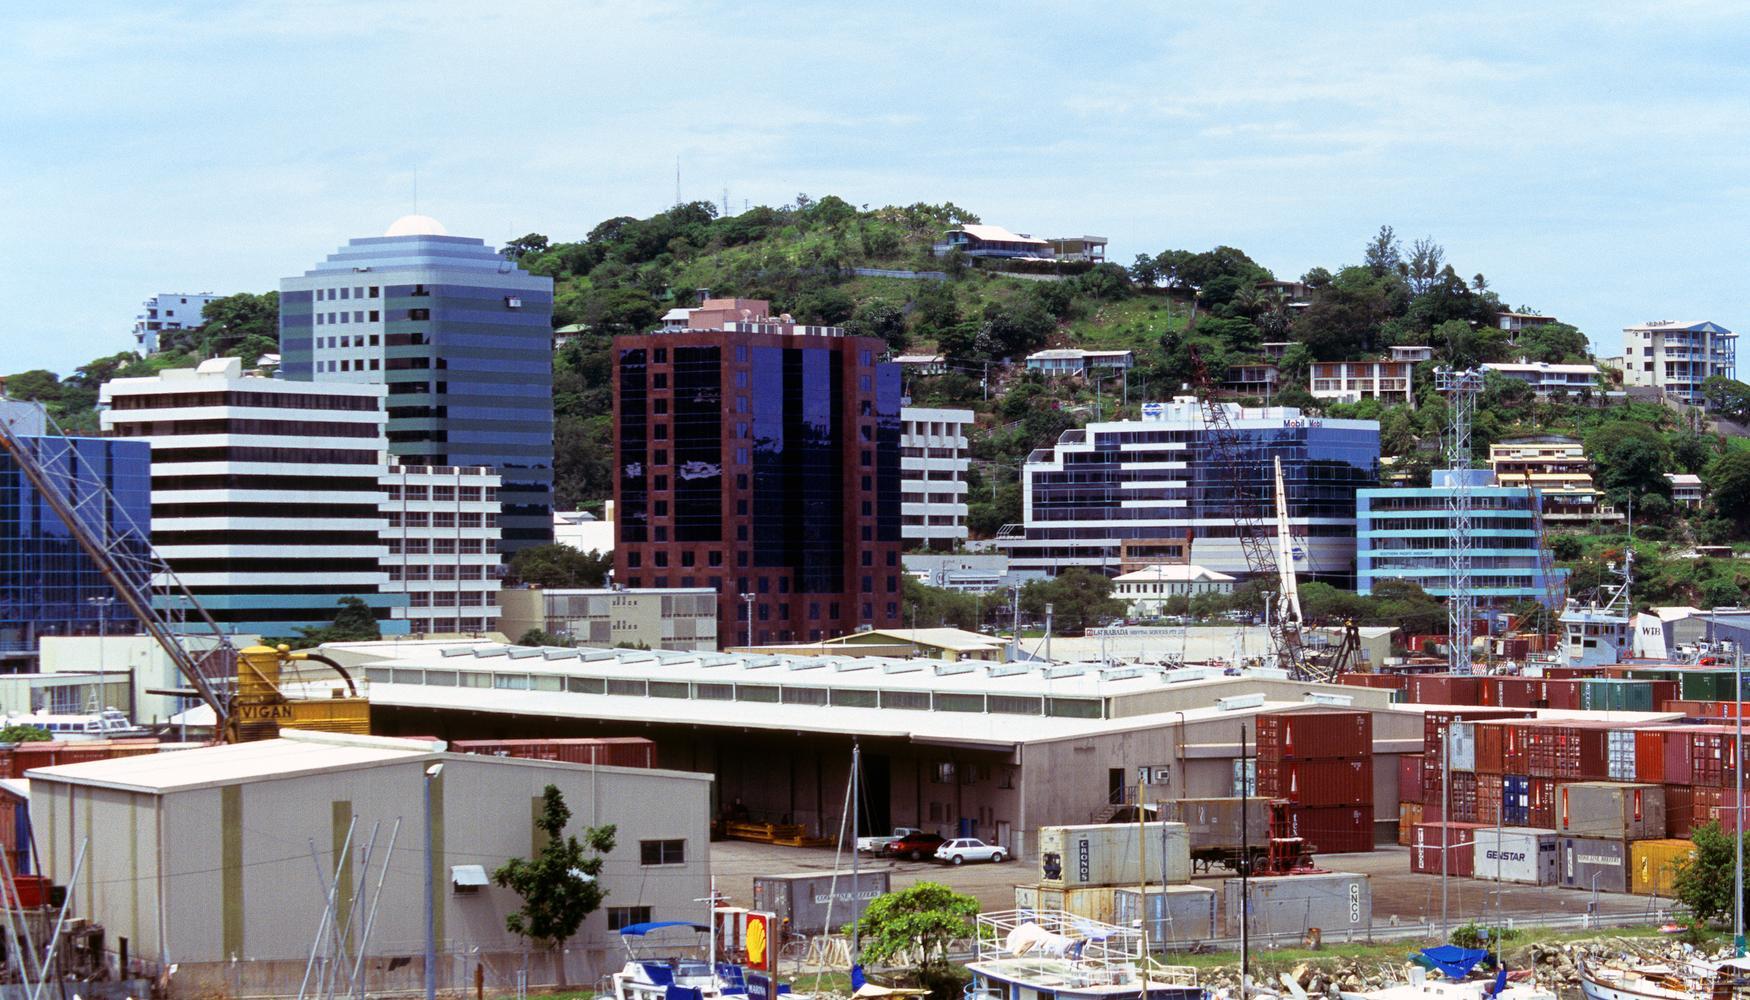 Mietwagen am Flughafen Port Moresby